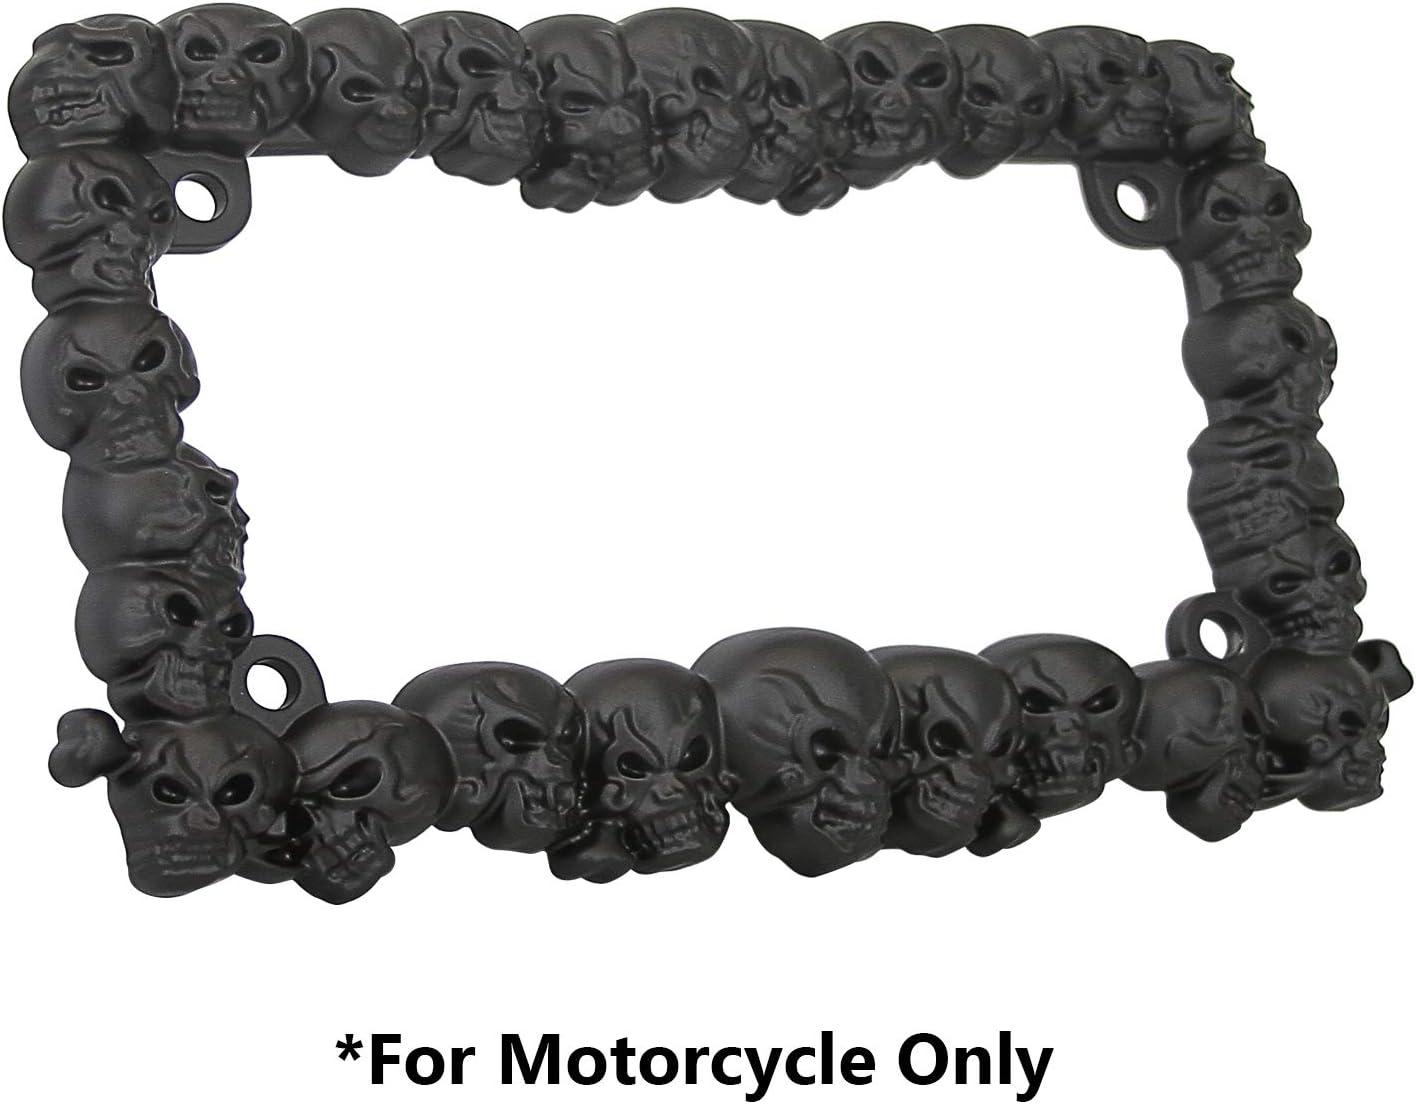 TC Japan's largest assortment Sportline LPF270-BK 3D Skulls Courier shipping free shipping Style Matte Fi Zinc Metal Black